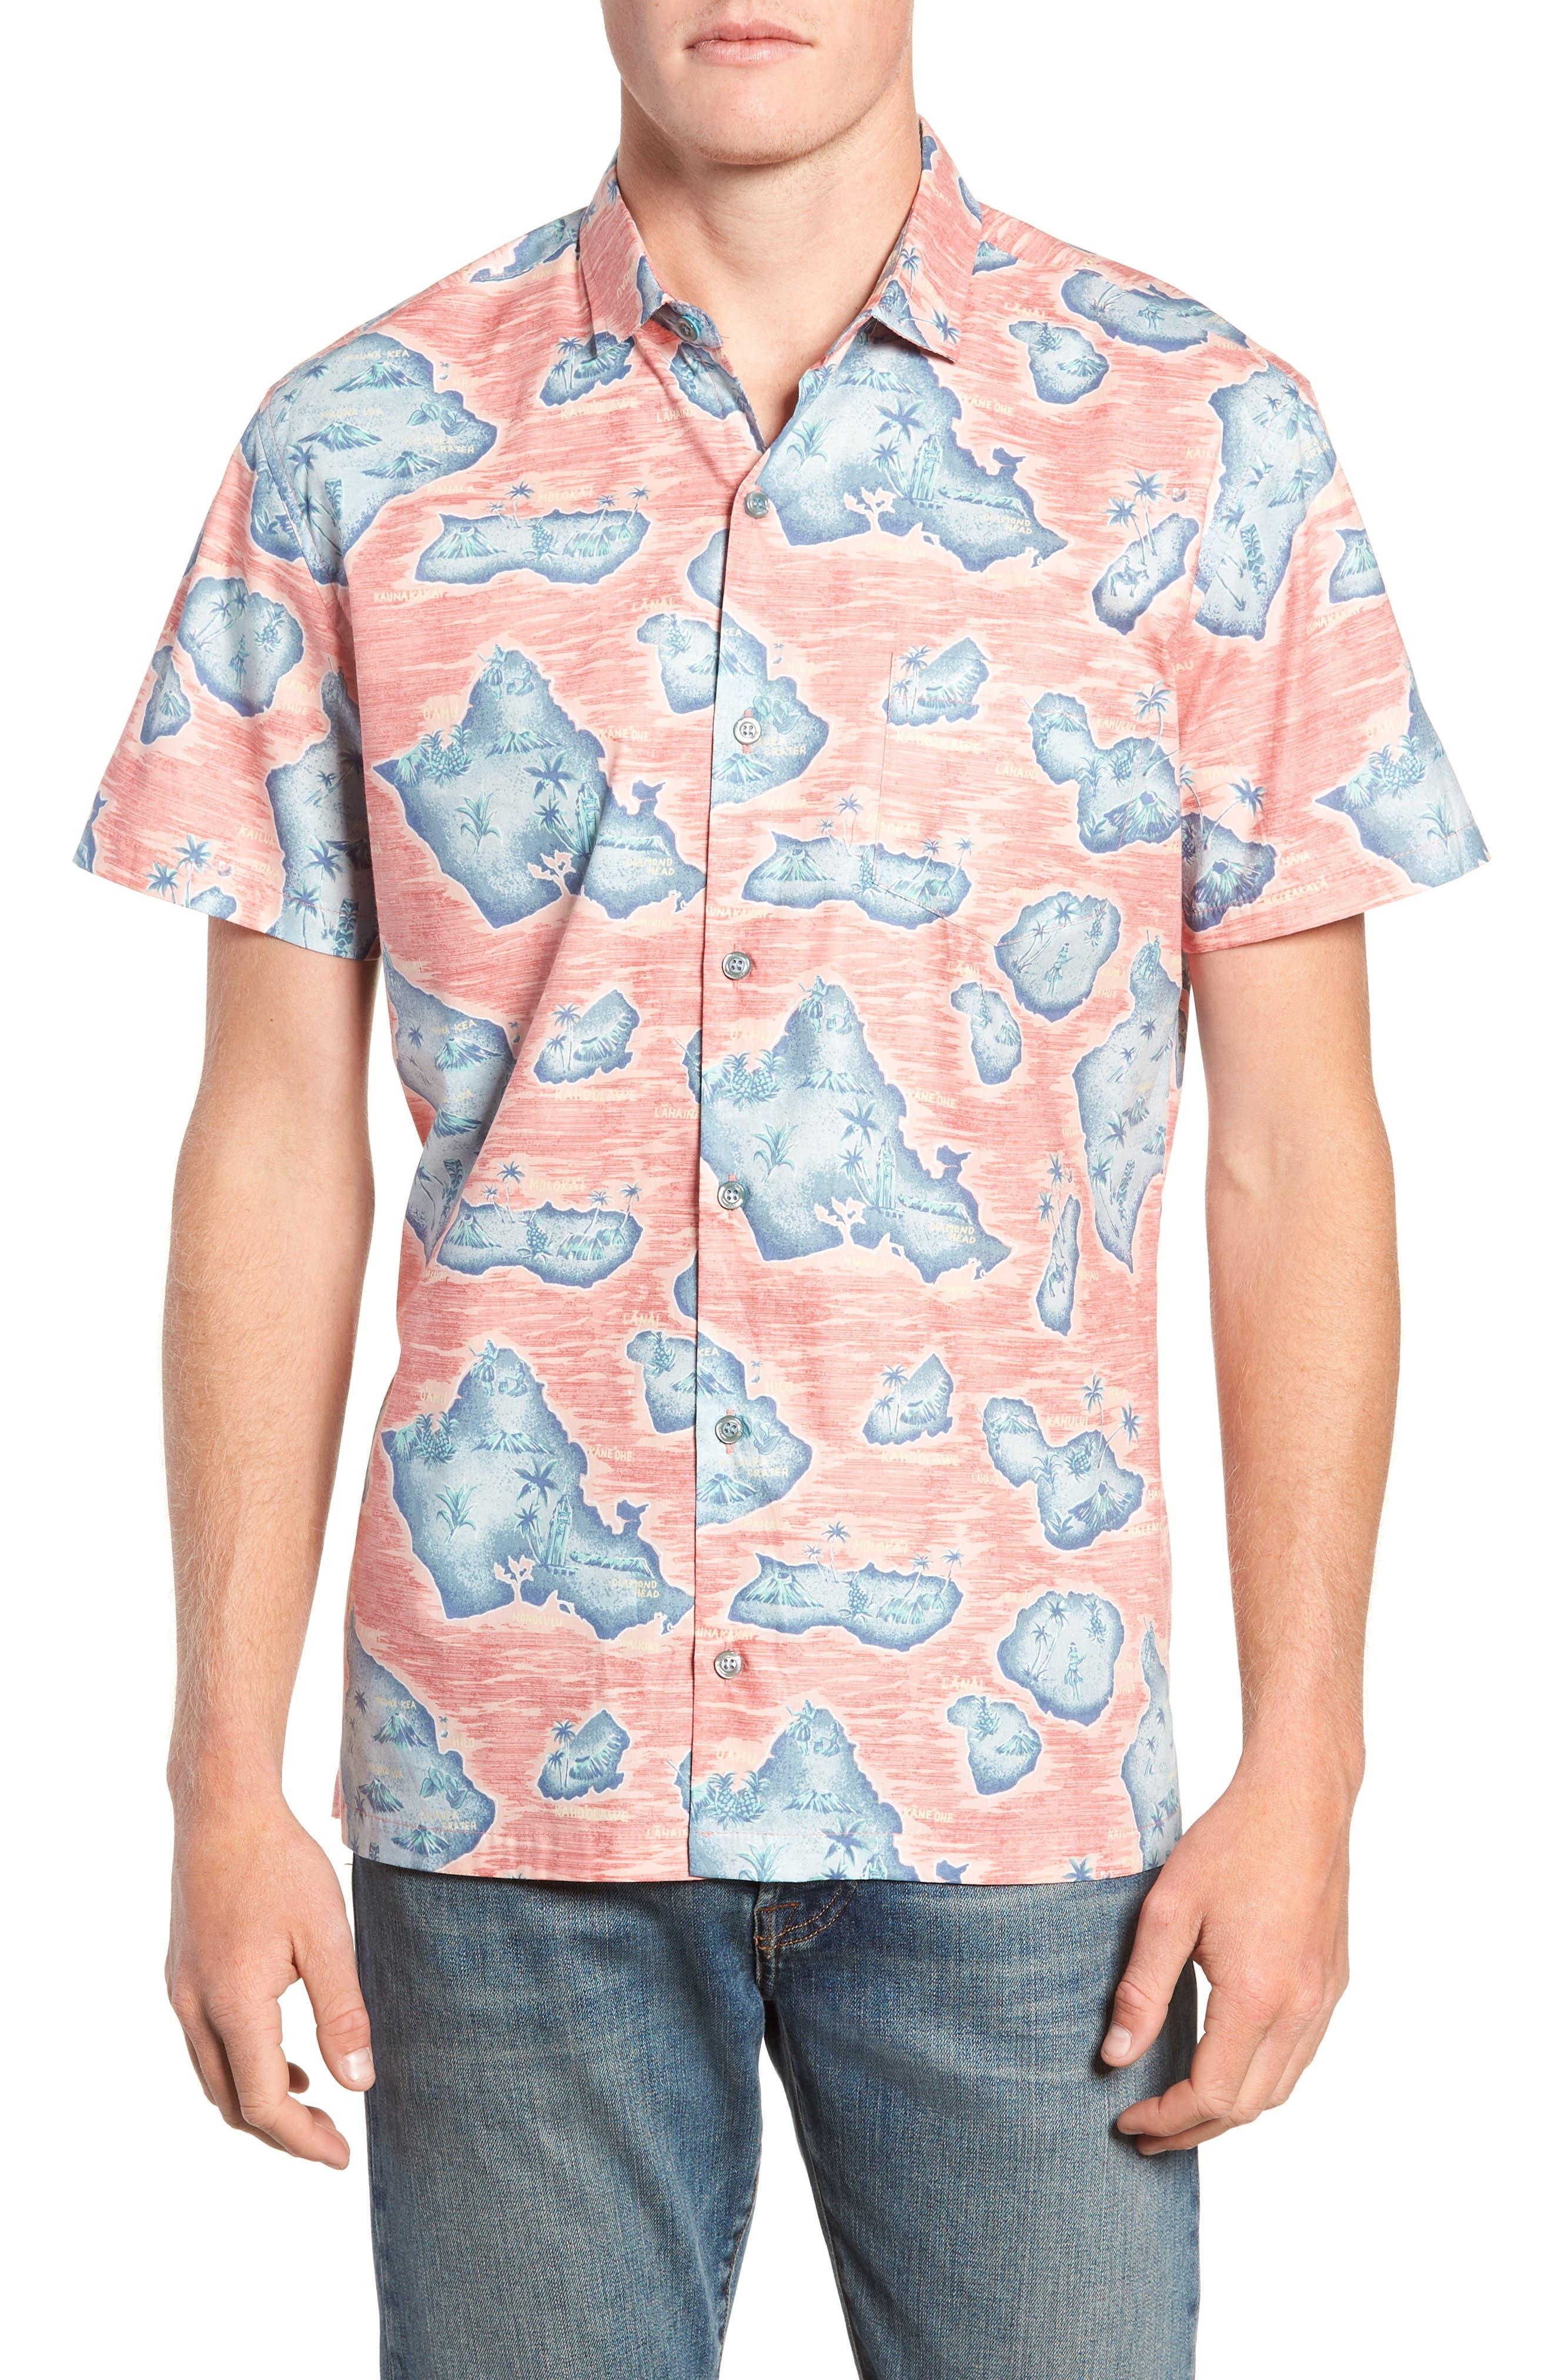 Tori Richard Sandwich Isle Regular Fit Sport Shirt, Orange